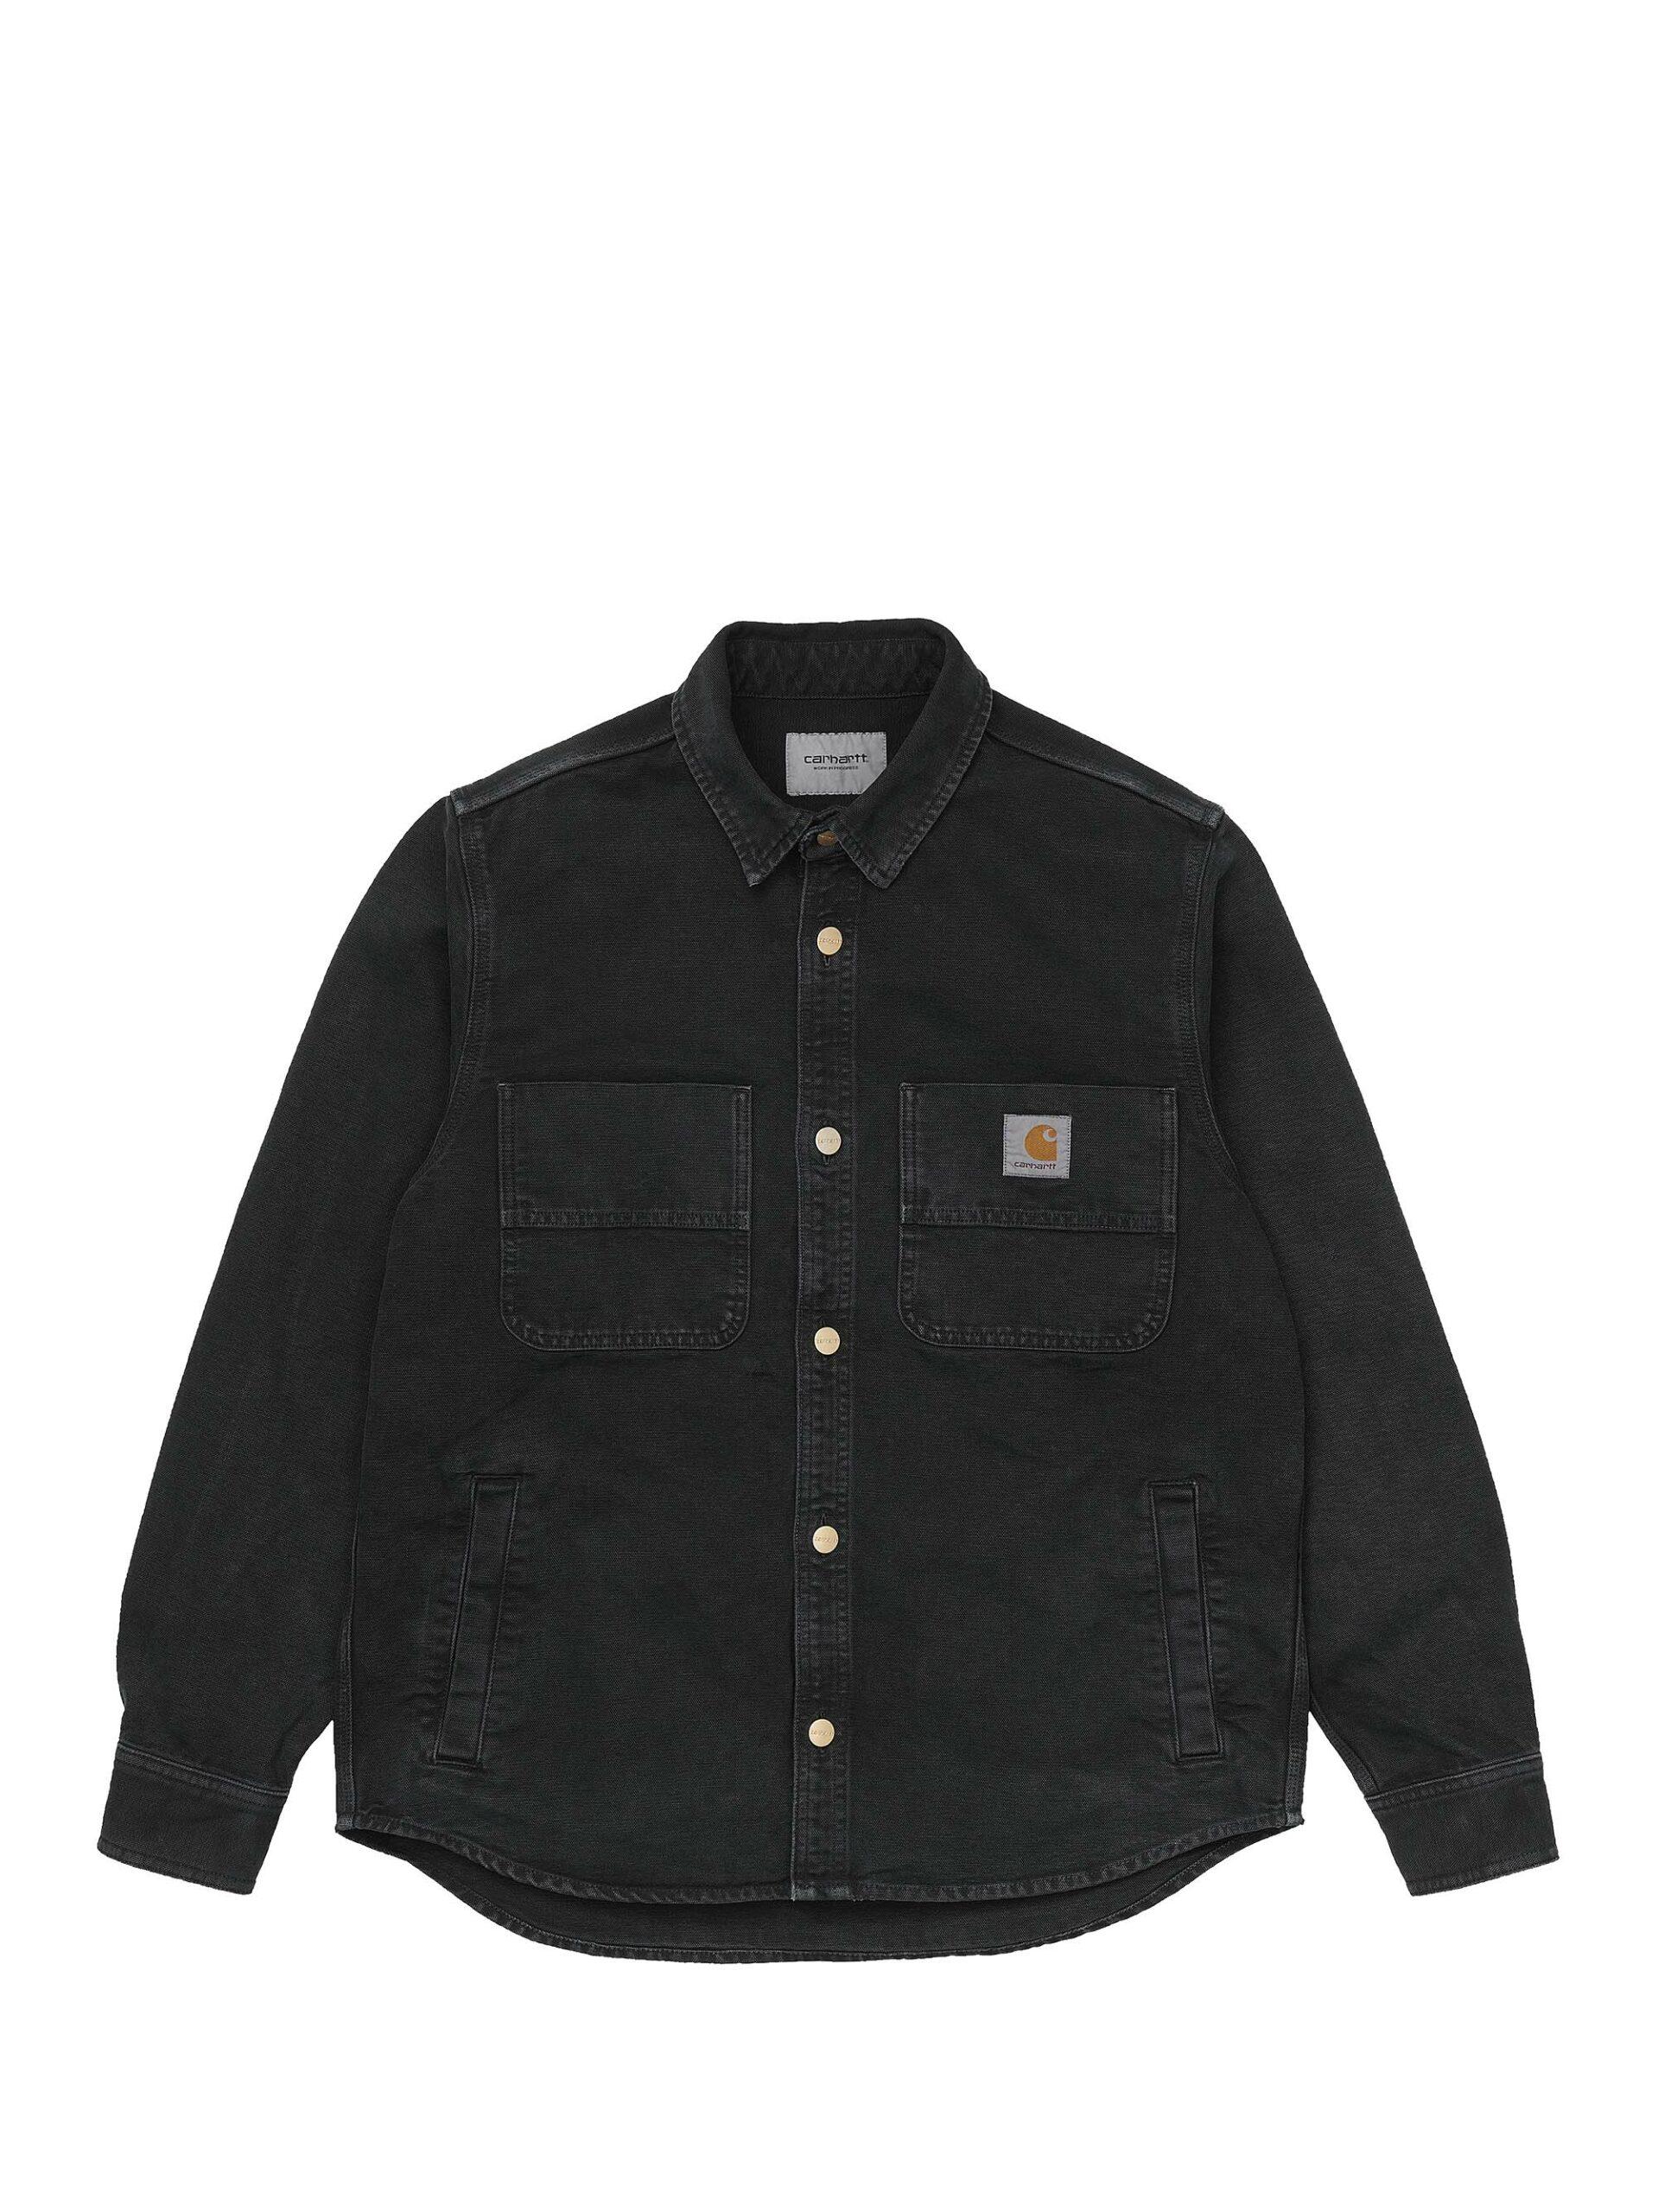 <p class='small-title'>CARHARTT WIP</p>Glenn Shirt Jacket Black Worn Canvas